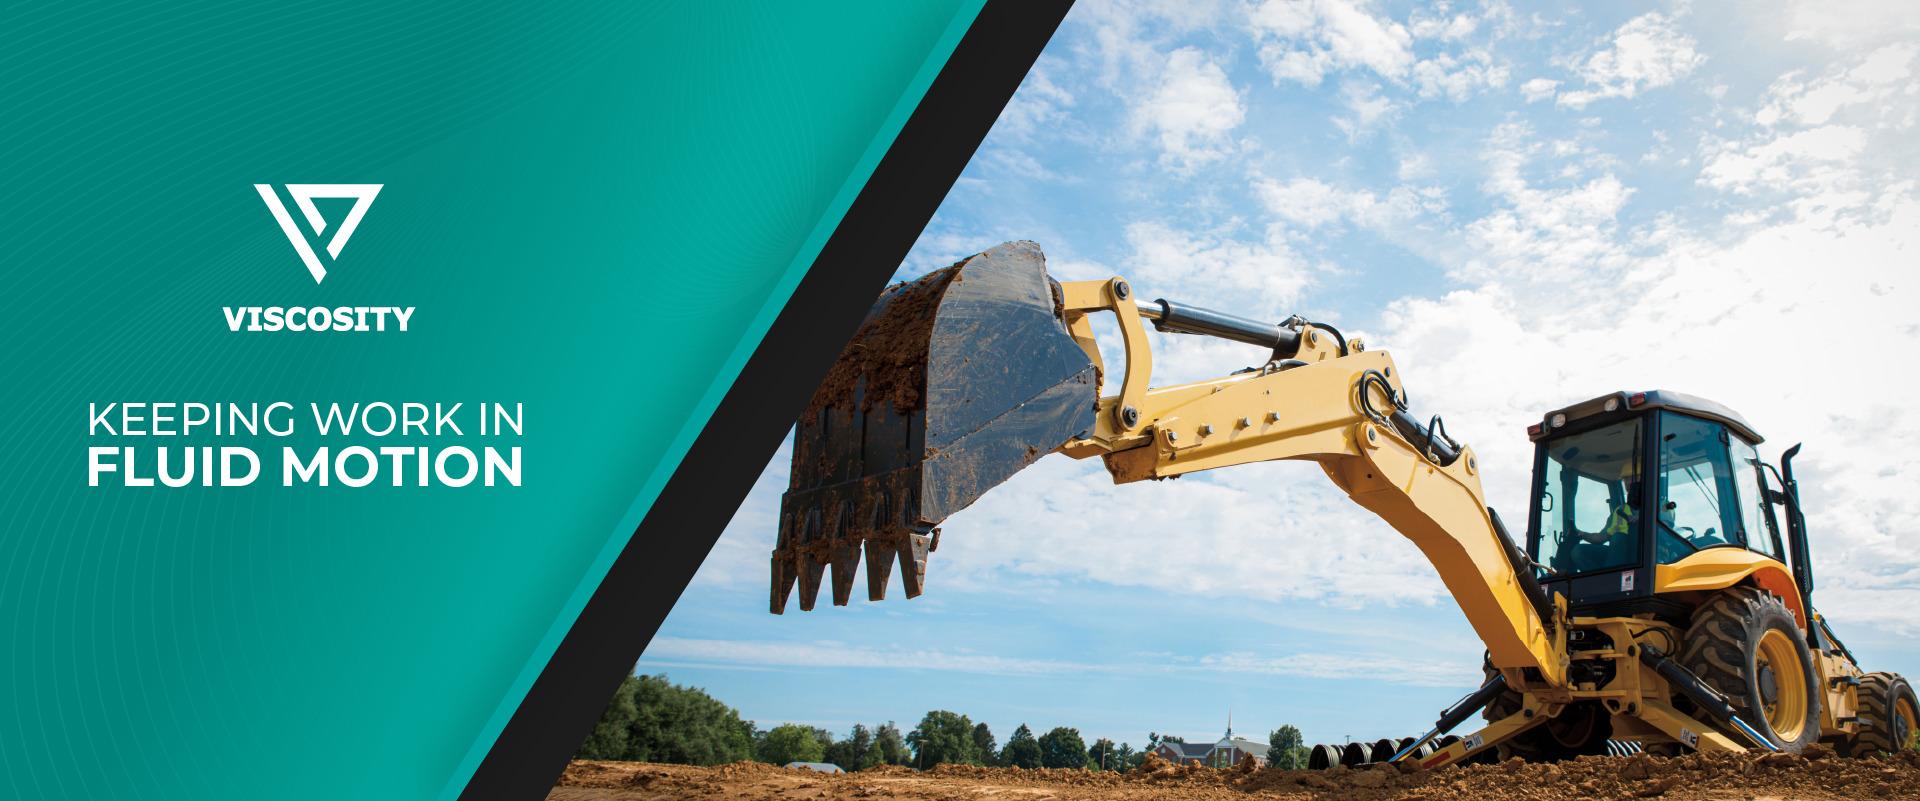 Keep work in fluid motion Excavator photo banner